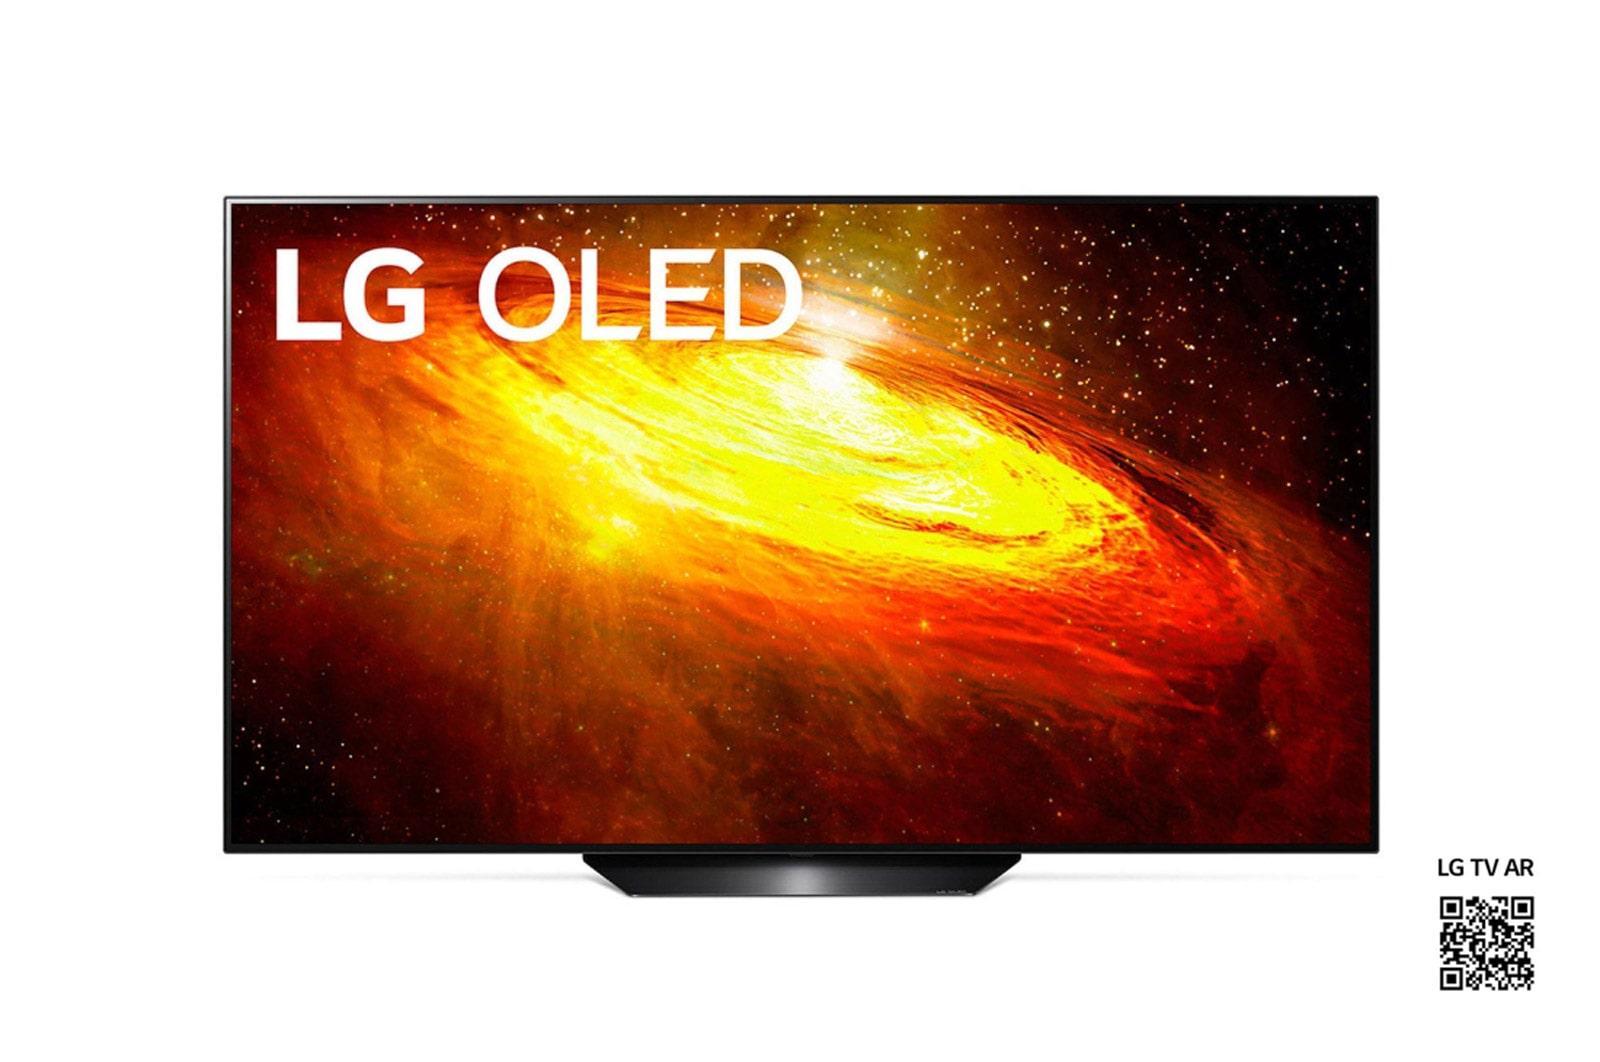 LG BX 55 ίντσες 4K Smart OLED TV - OLED55BX6LB main image